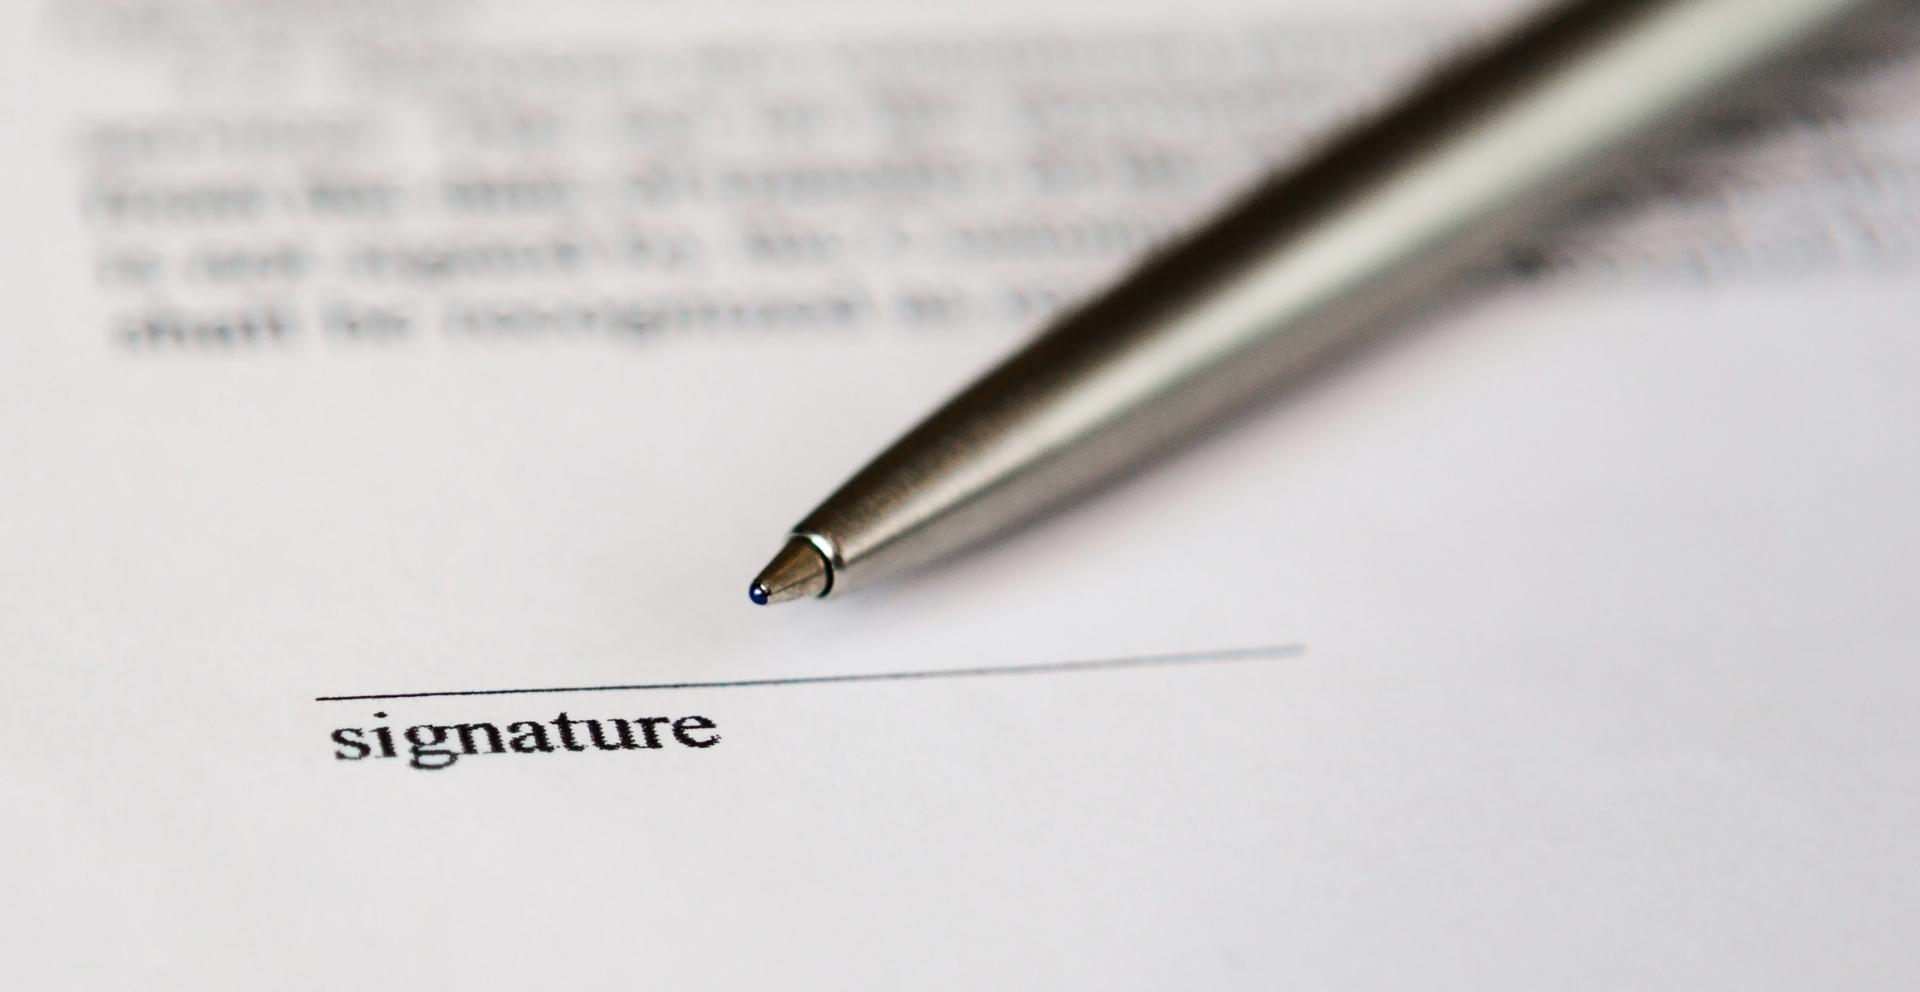 add signature field to pdf | Add signature field to pdf feature image